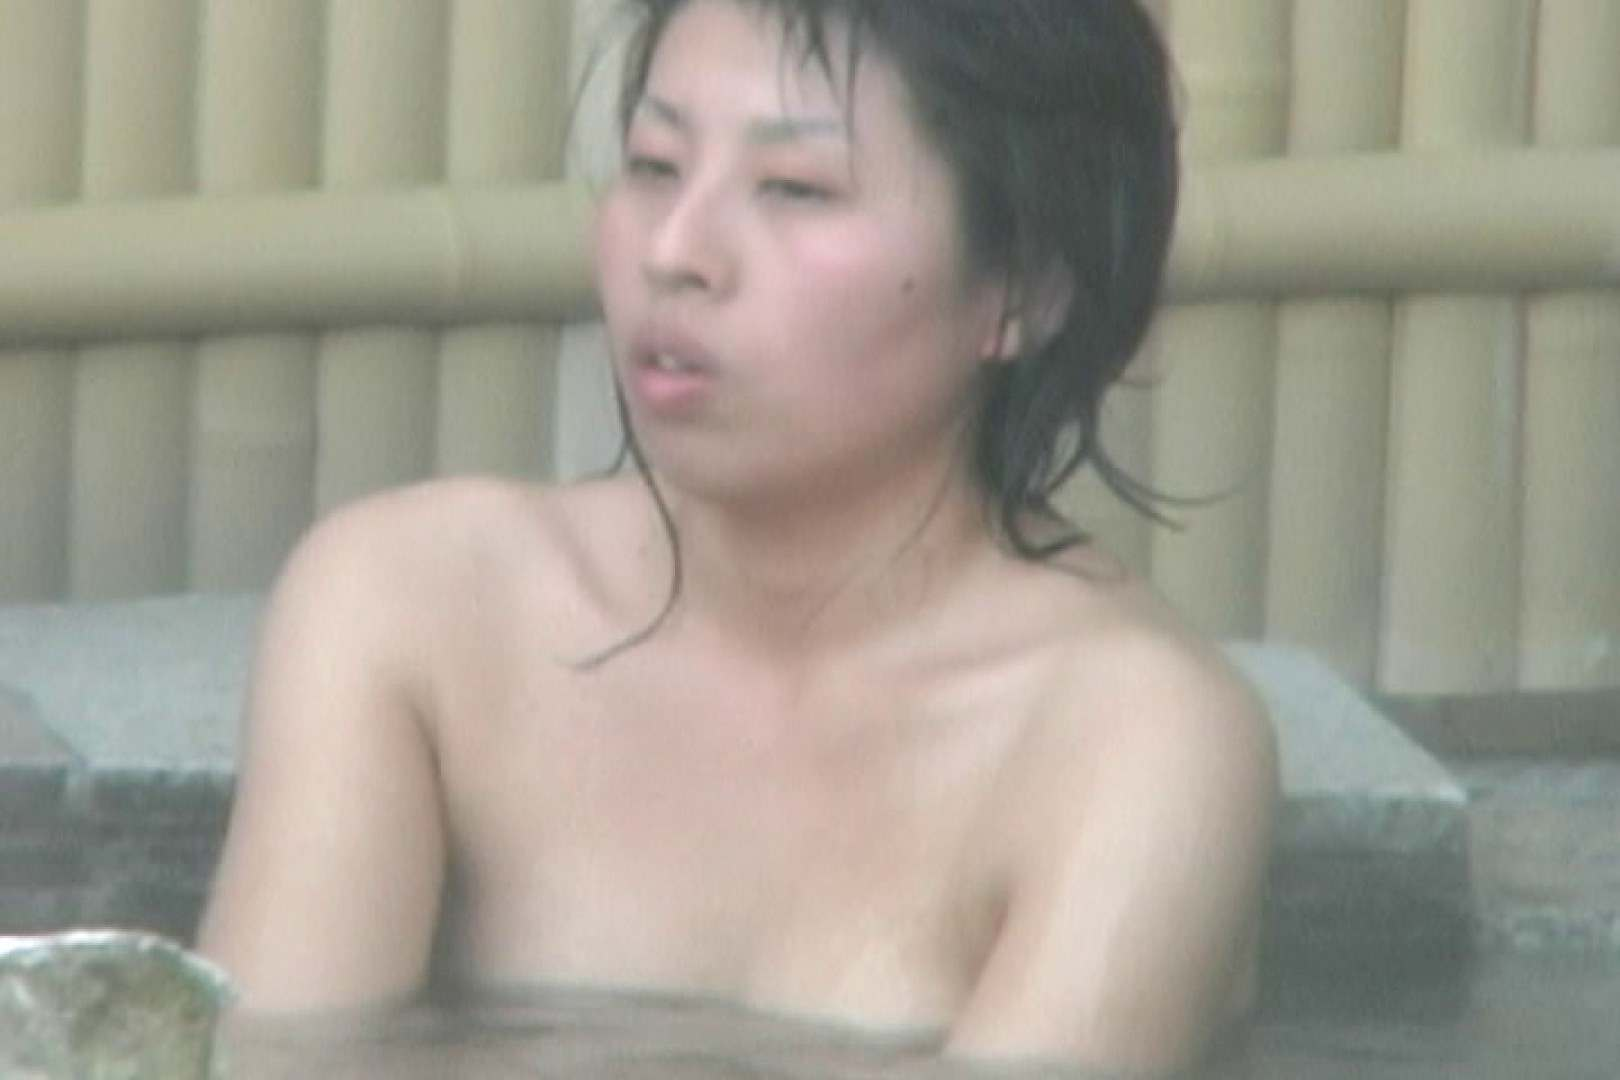 Aquaな露天風呂Vol.589 0   0  74連発 47